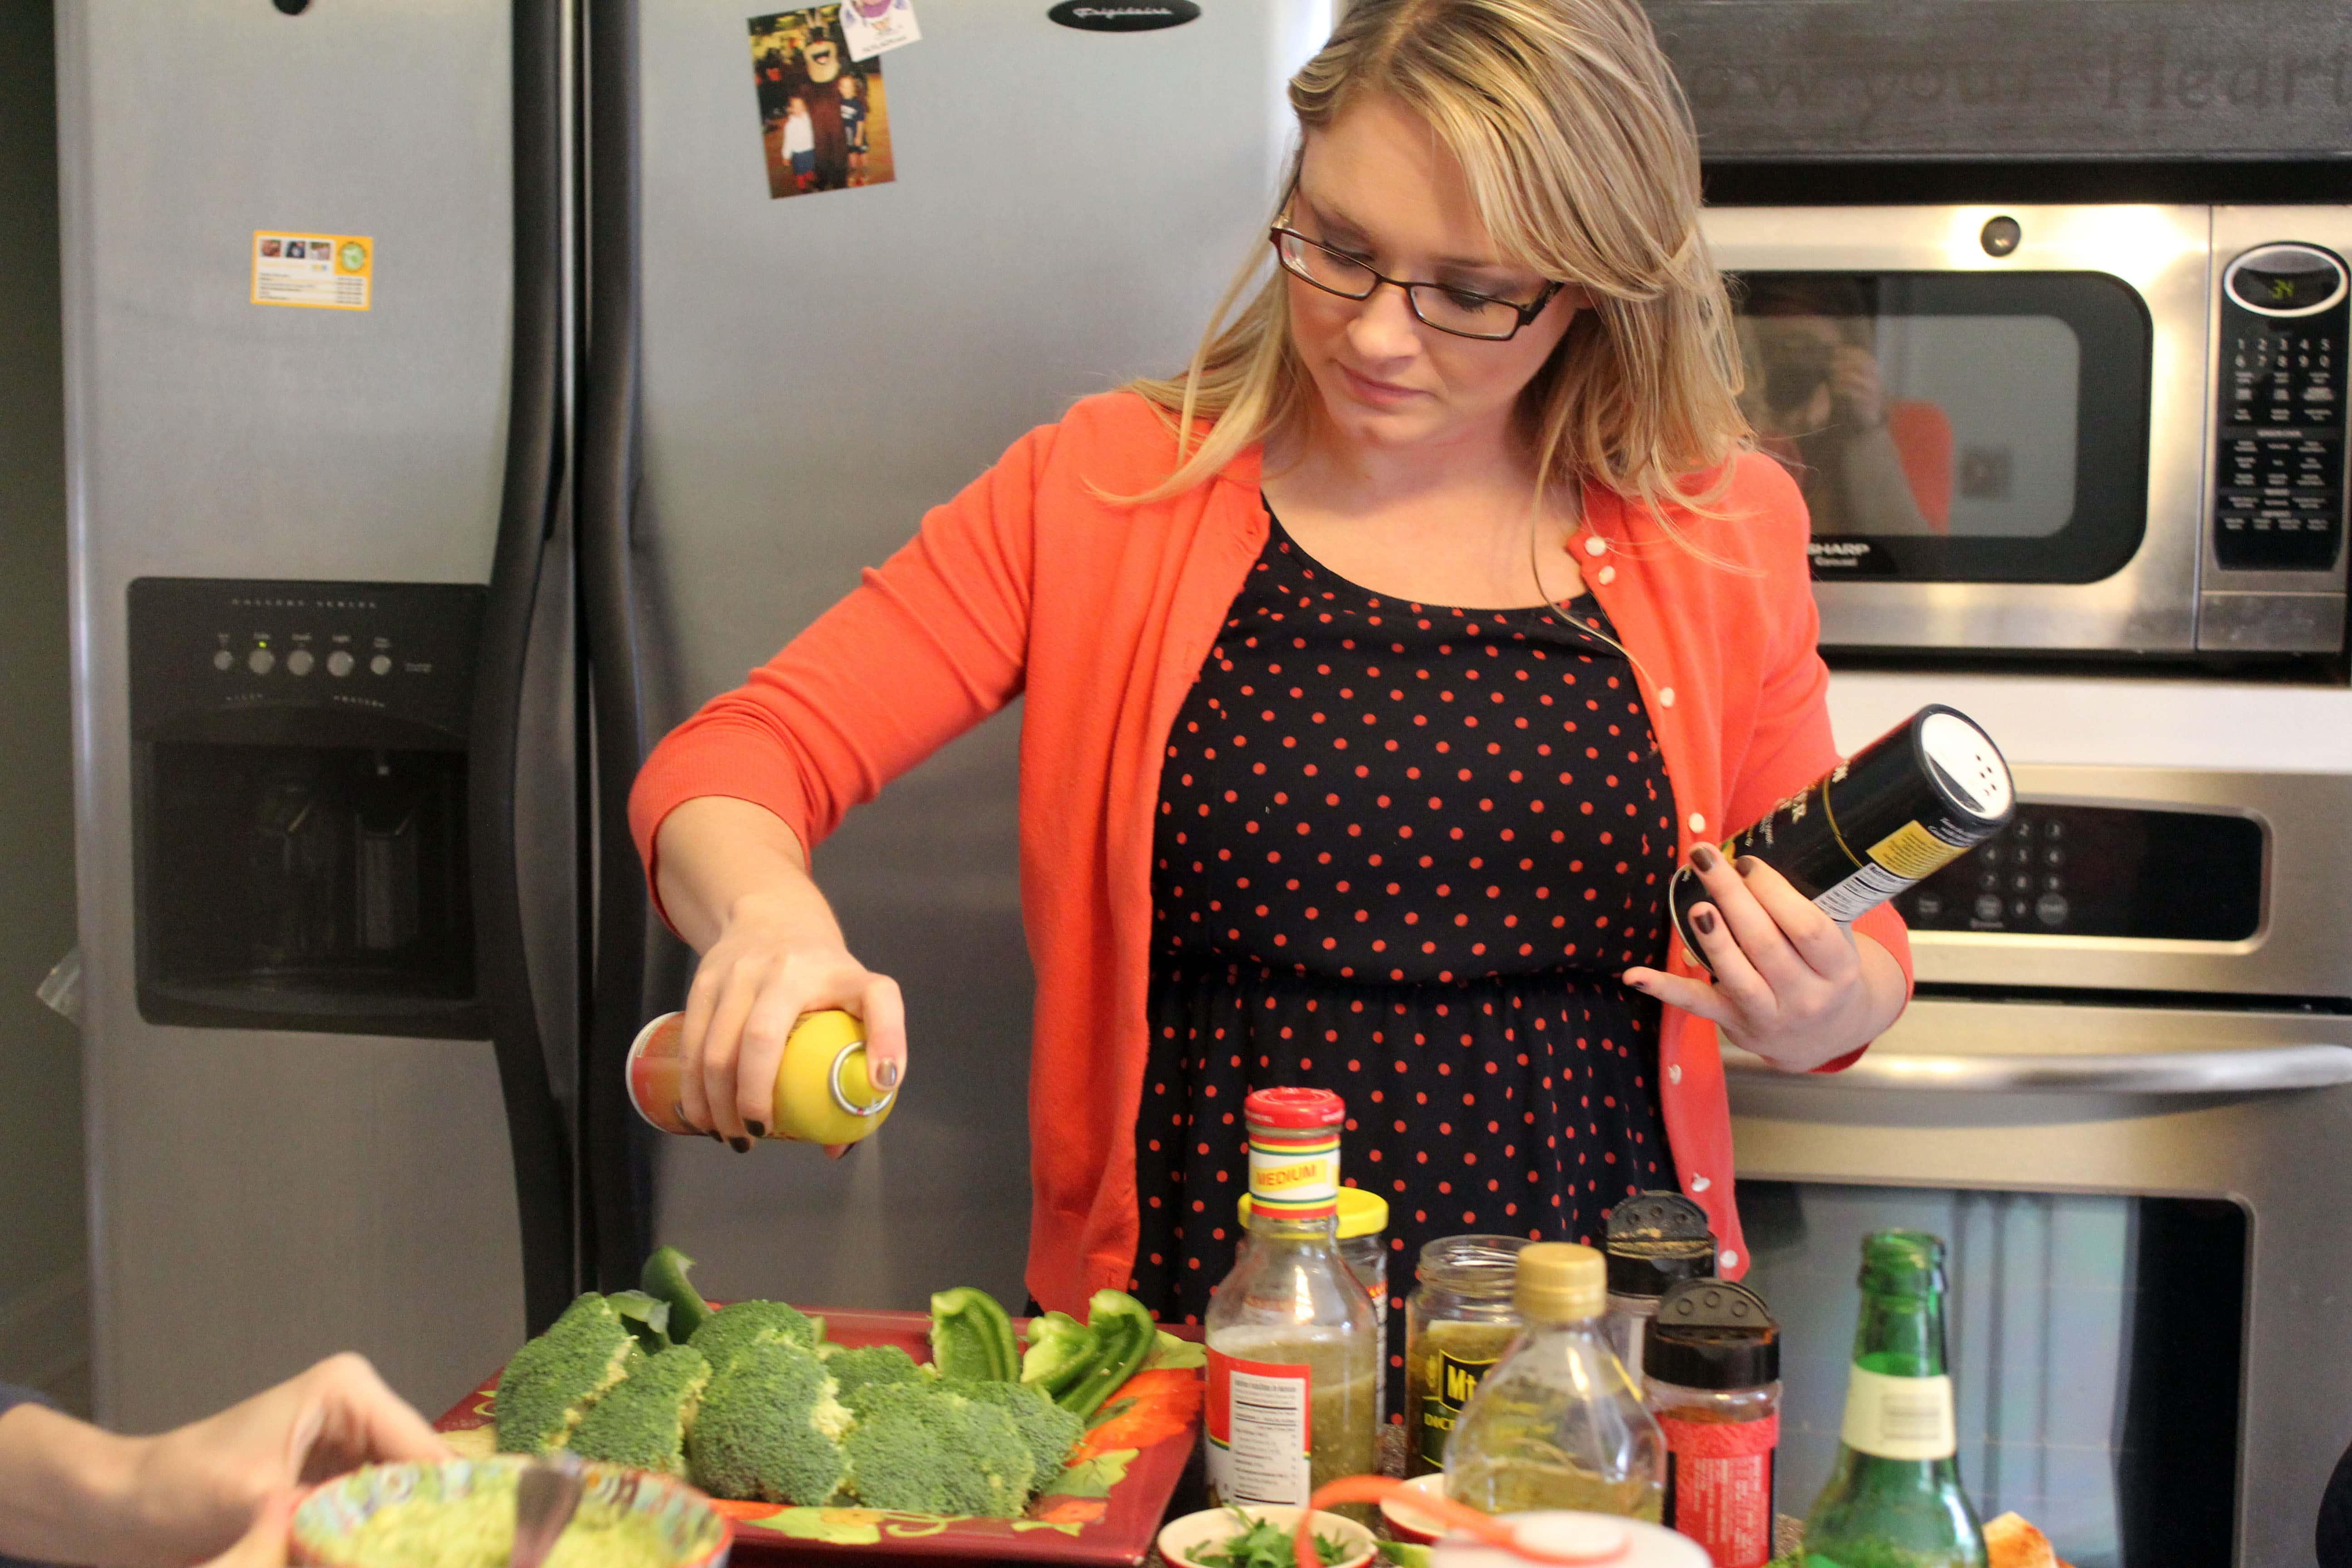 Lindsay cooking